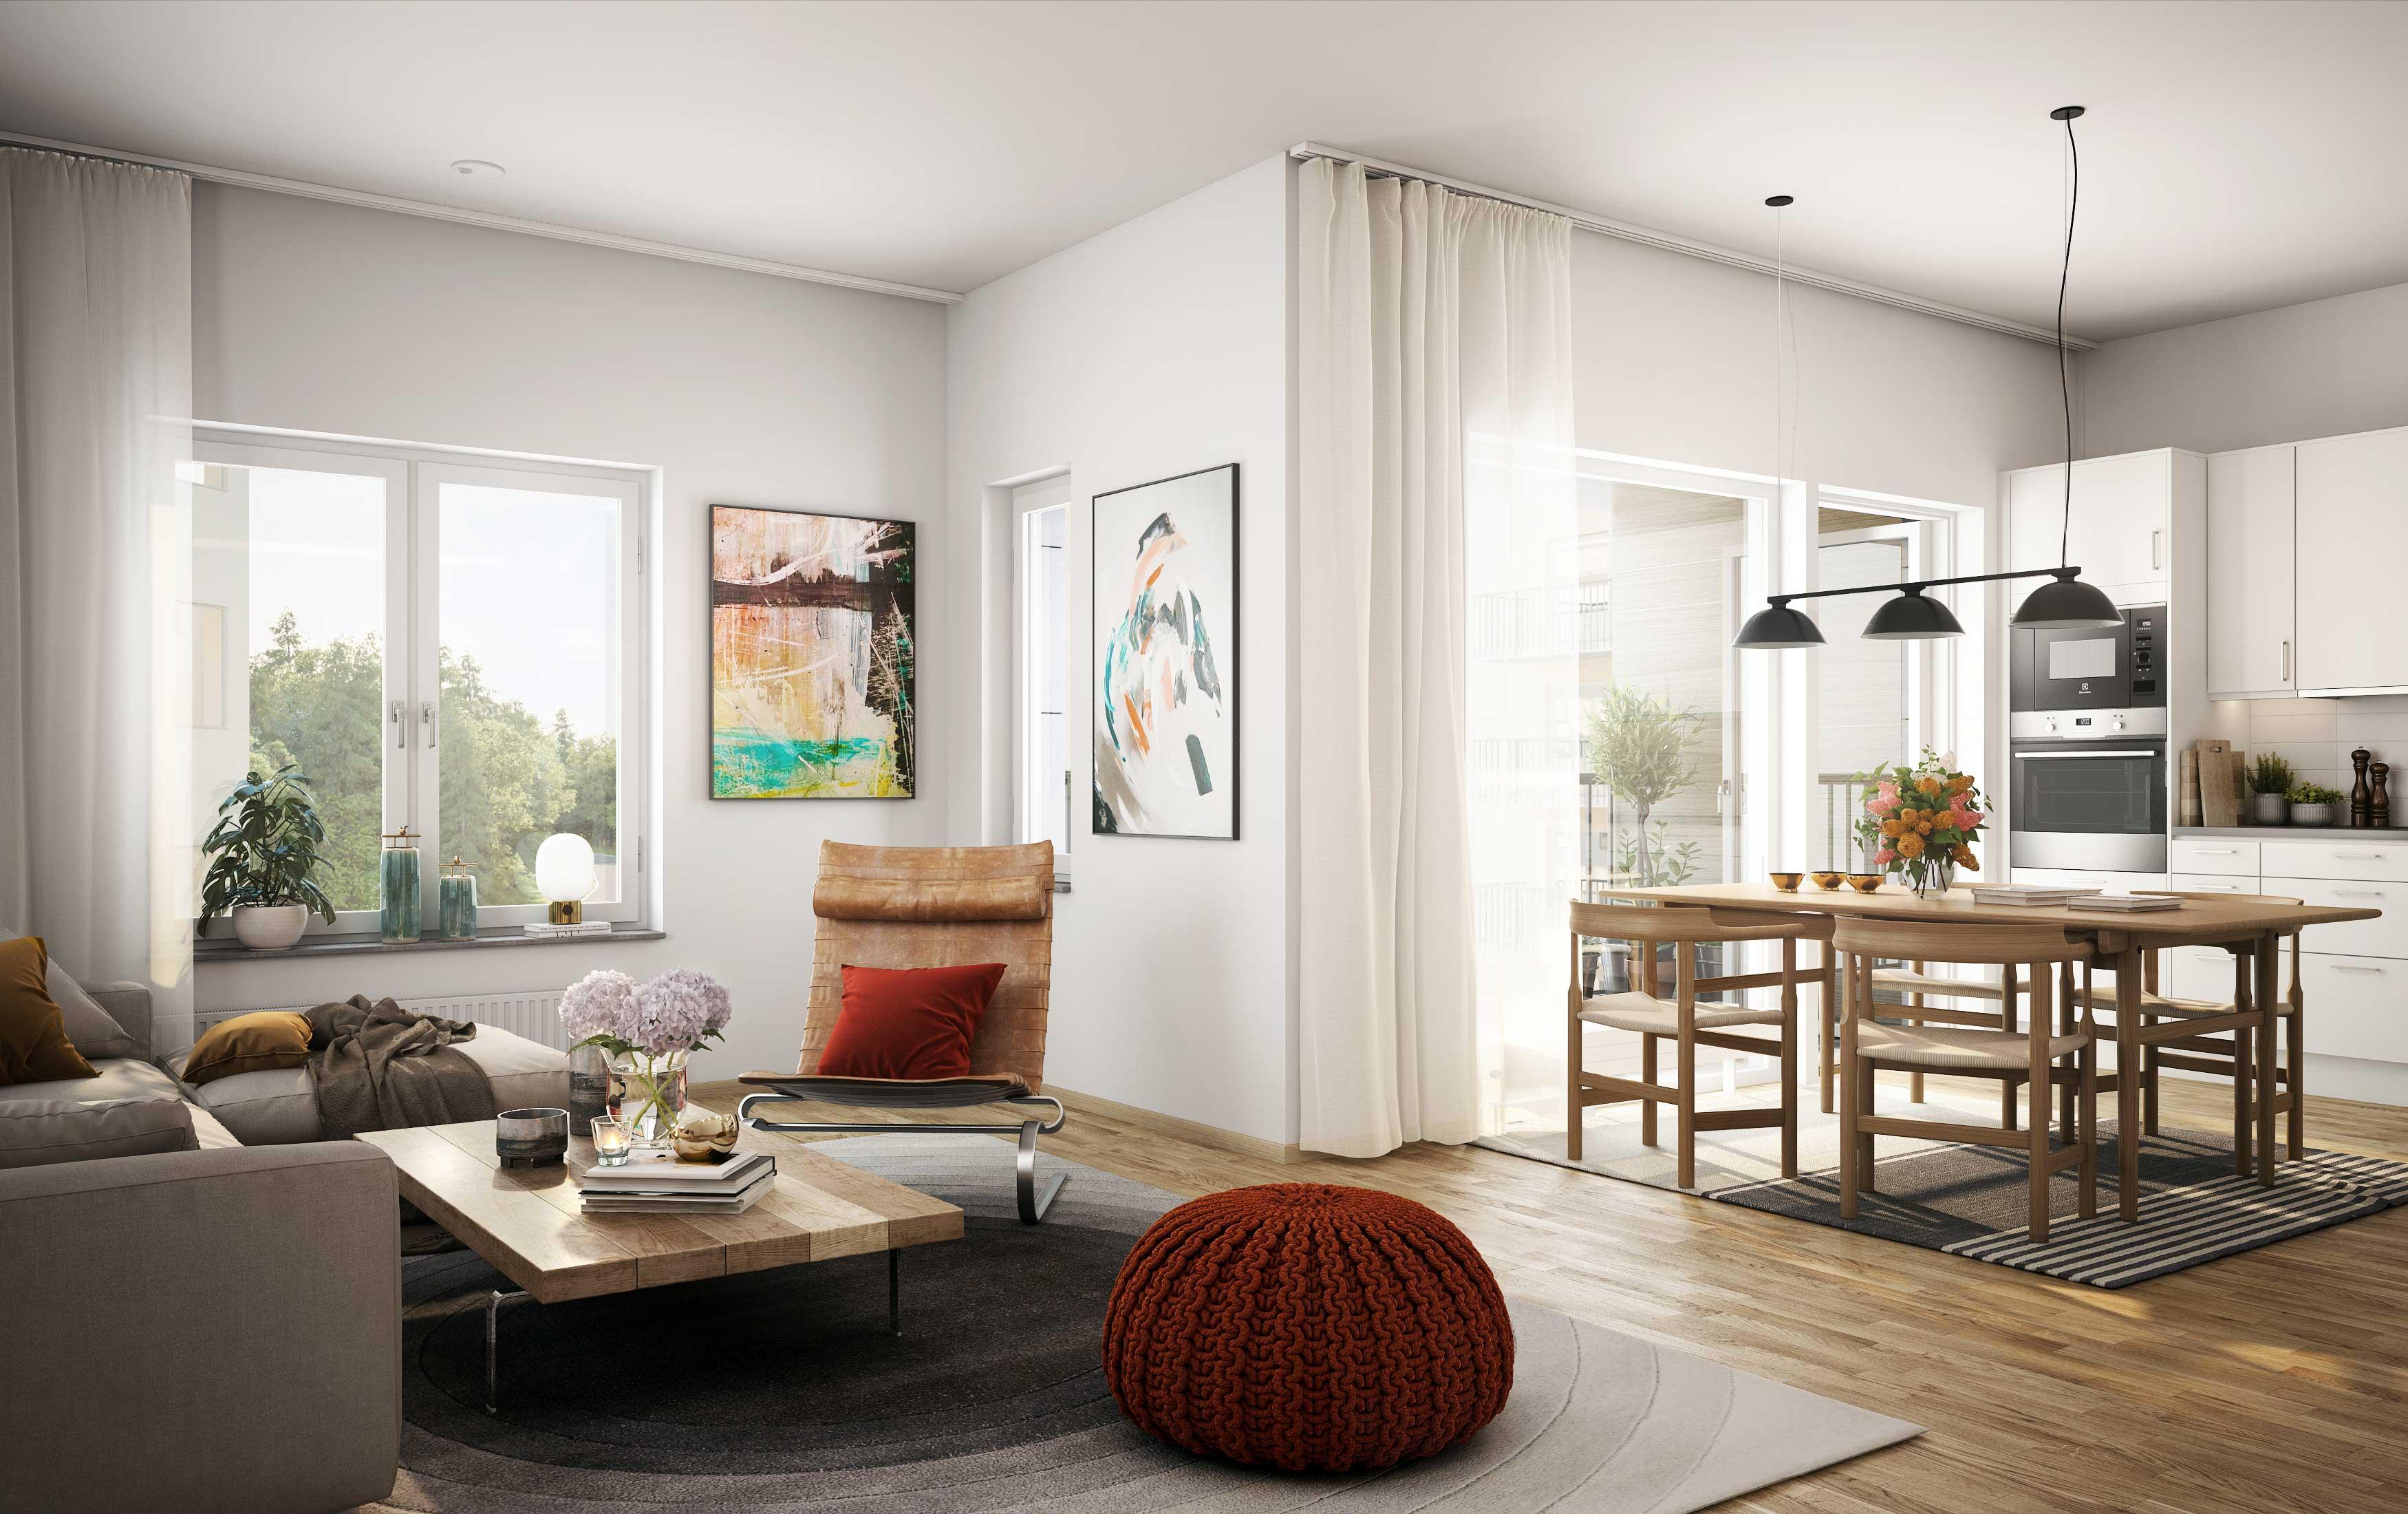 Yteffektiva lägenheter